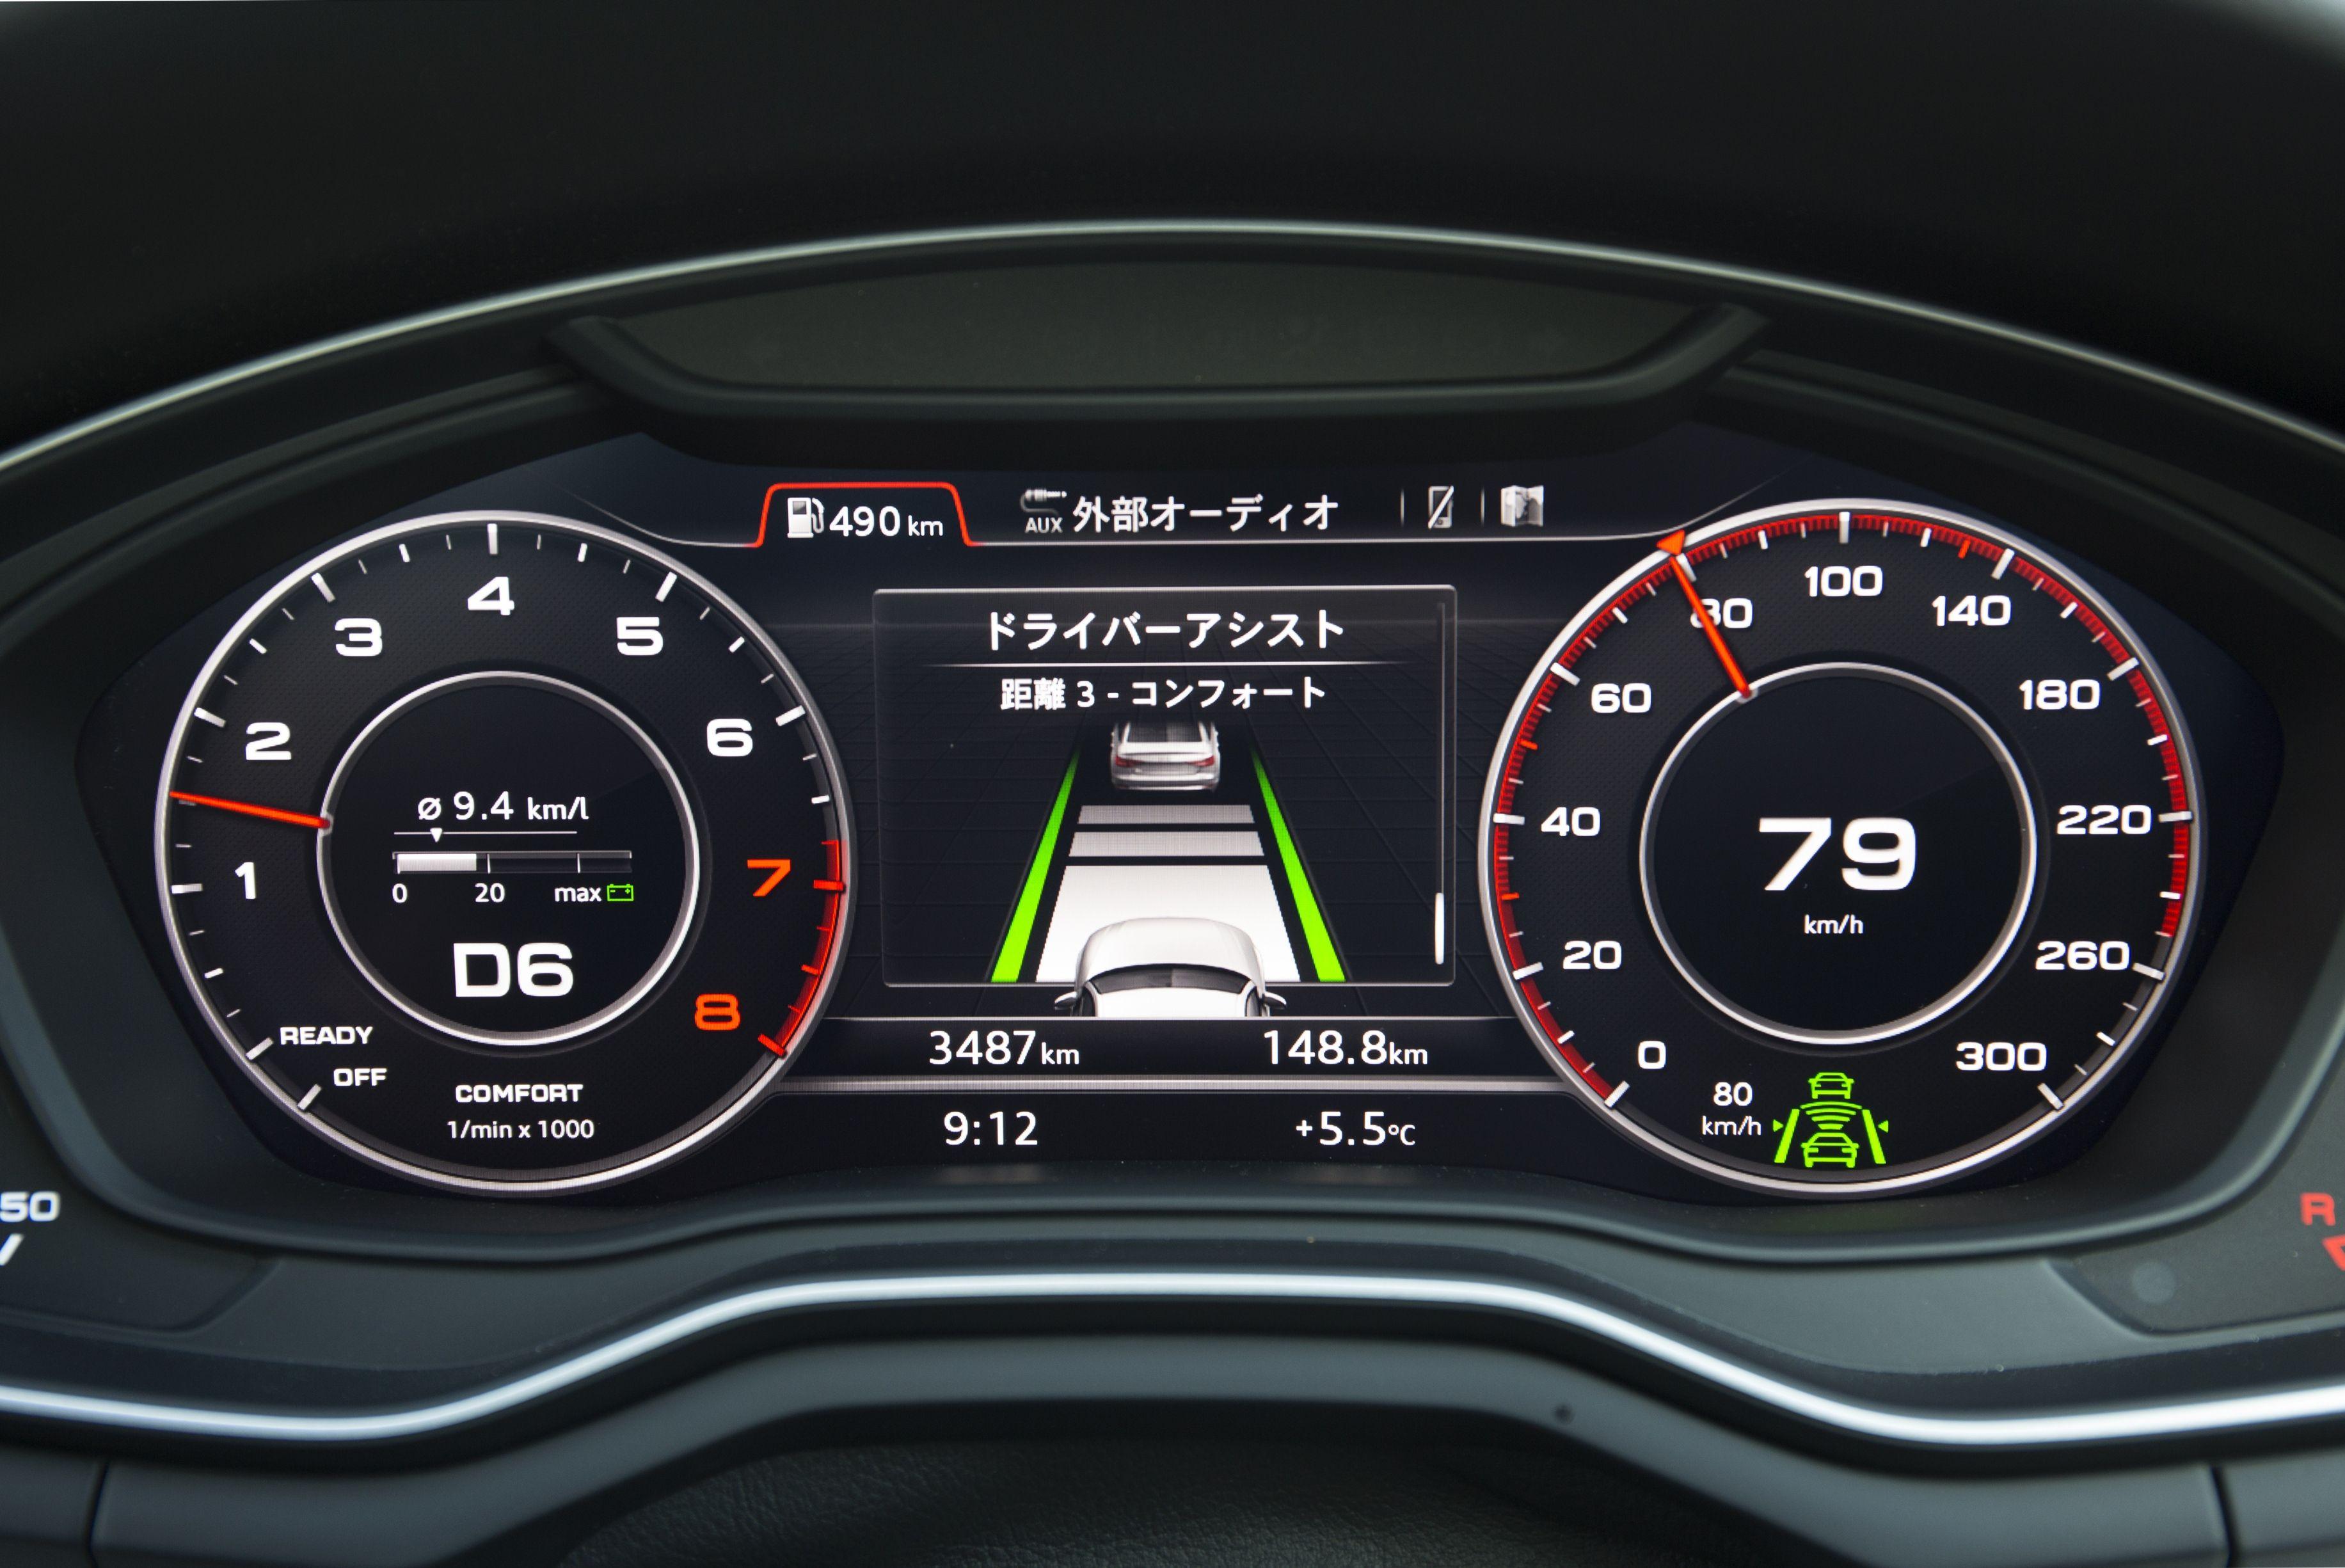 Audi A4 2 0 Tfsi Quattro S Line 63 Jpeg 3665 2451